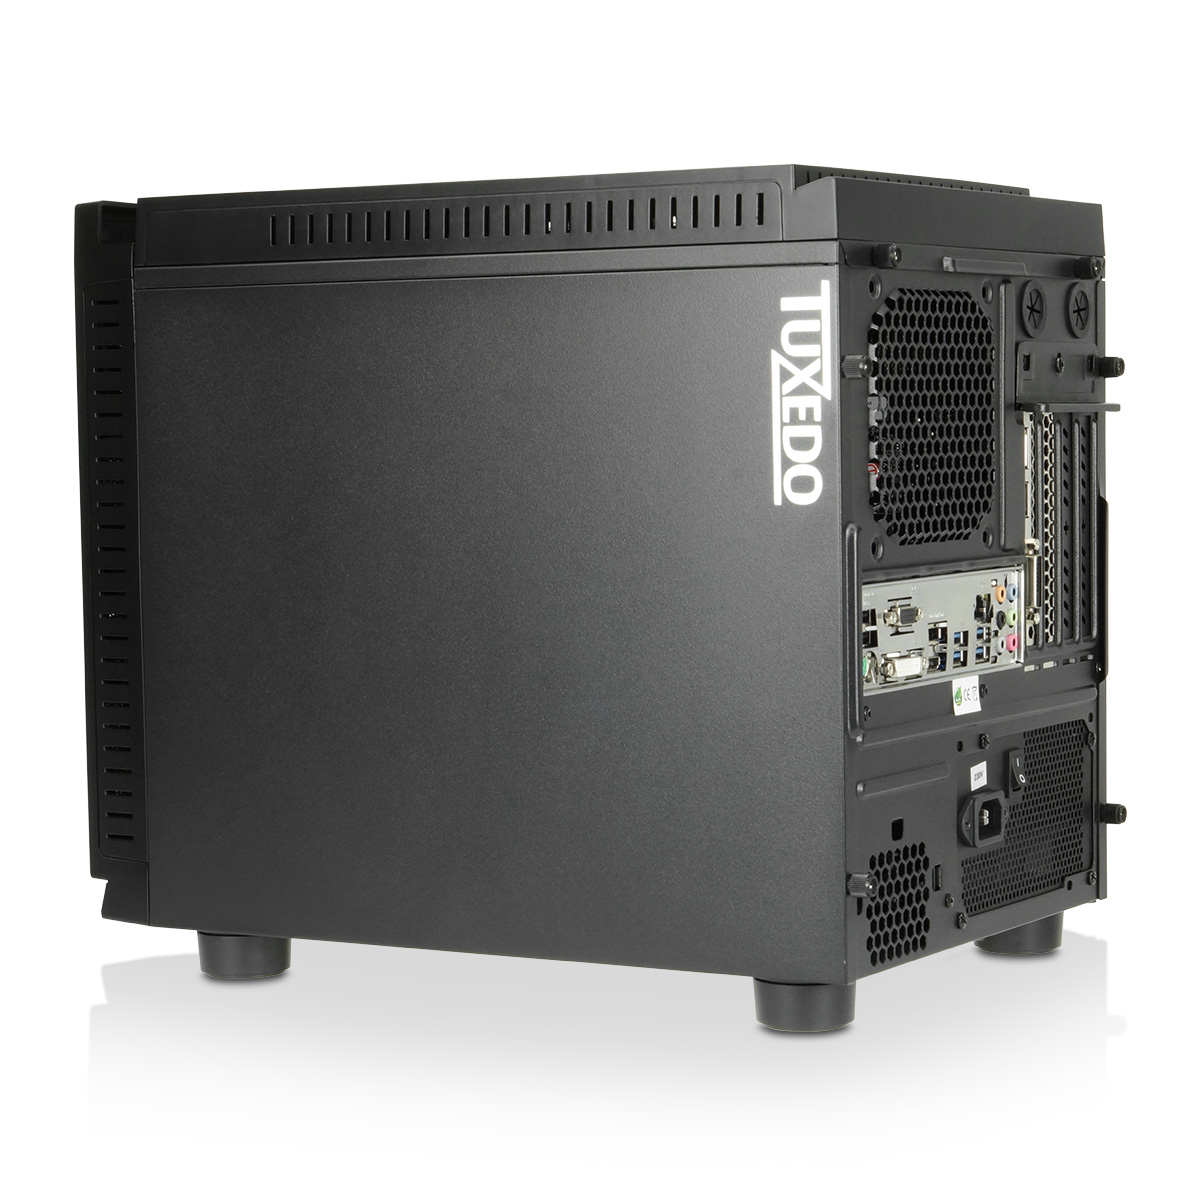 Tuxedo Cube V8 Intel Core Series High End Cpus Opt Nvidia Logo Stiker Amd Energy Star Windows Geforce